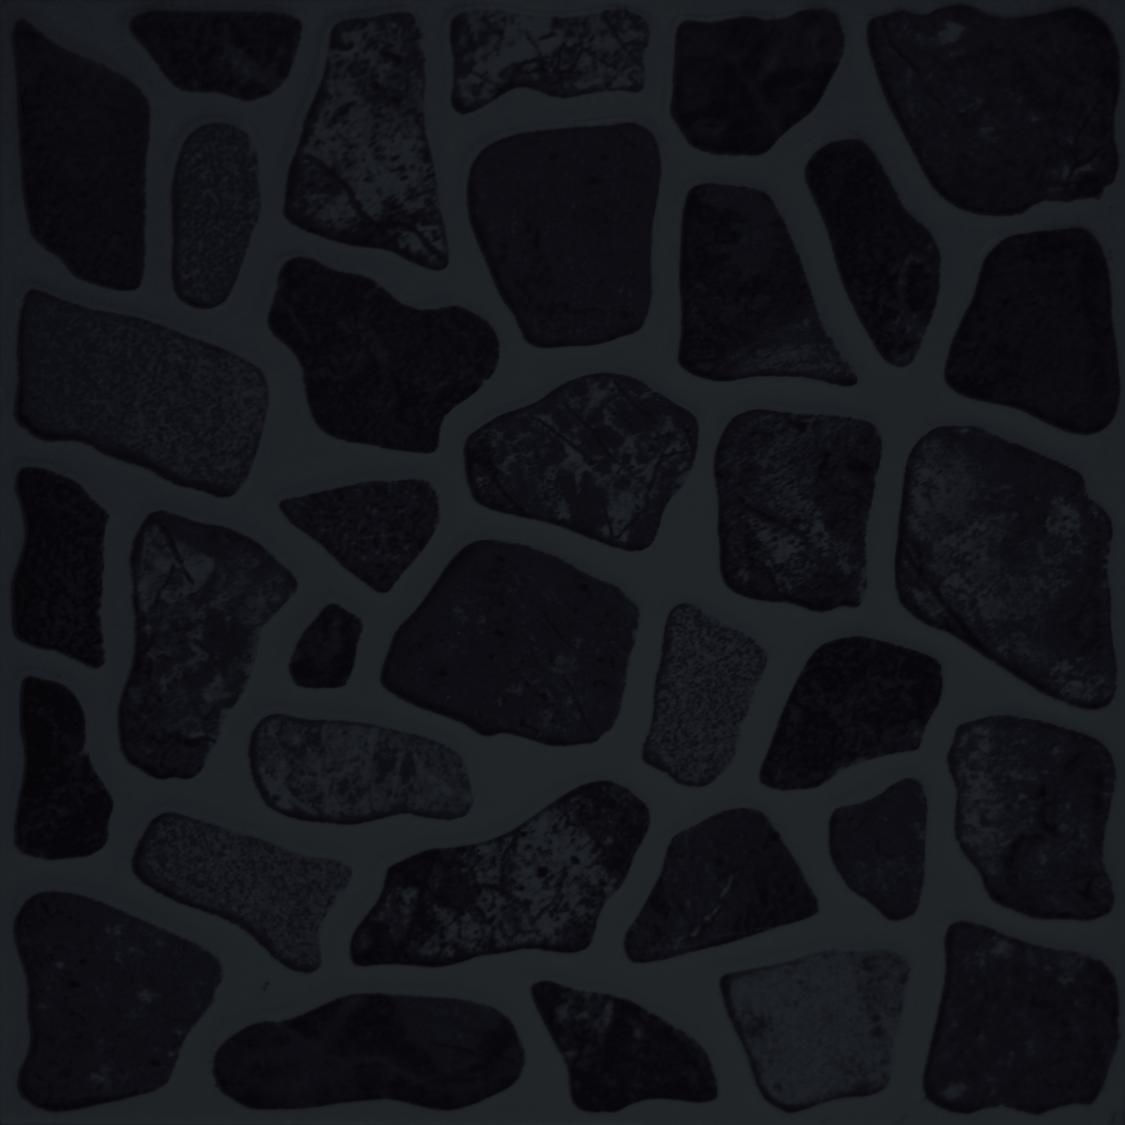 3030151-MBK